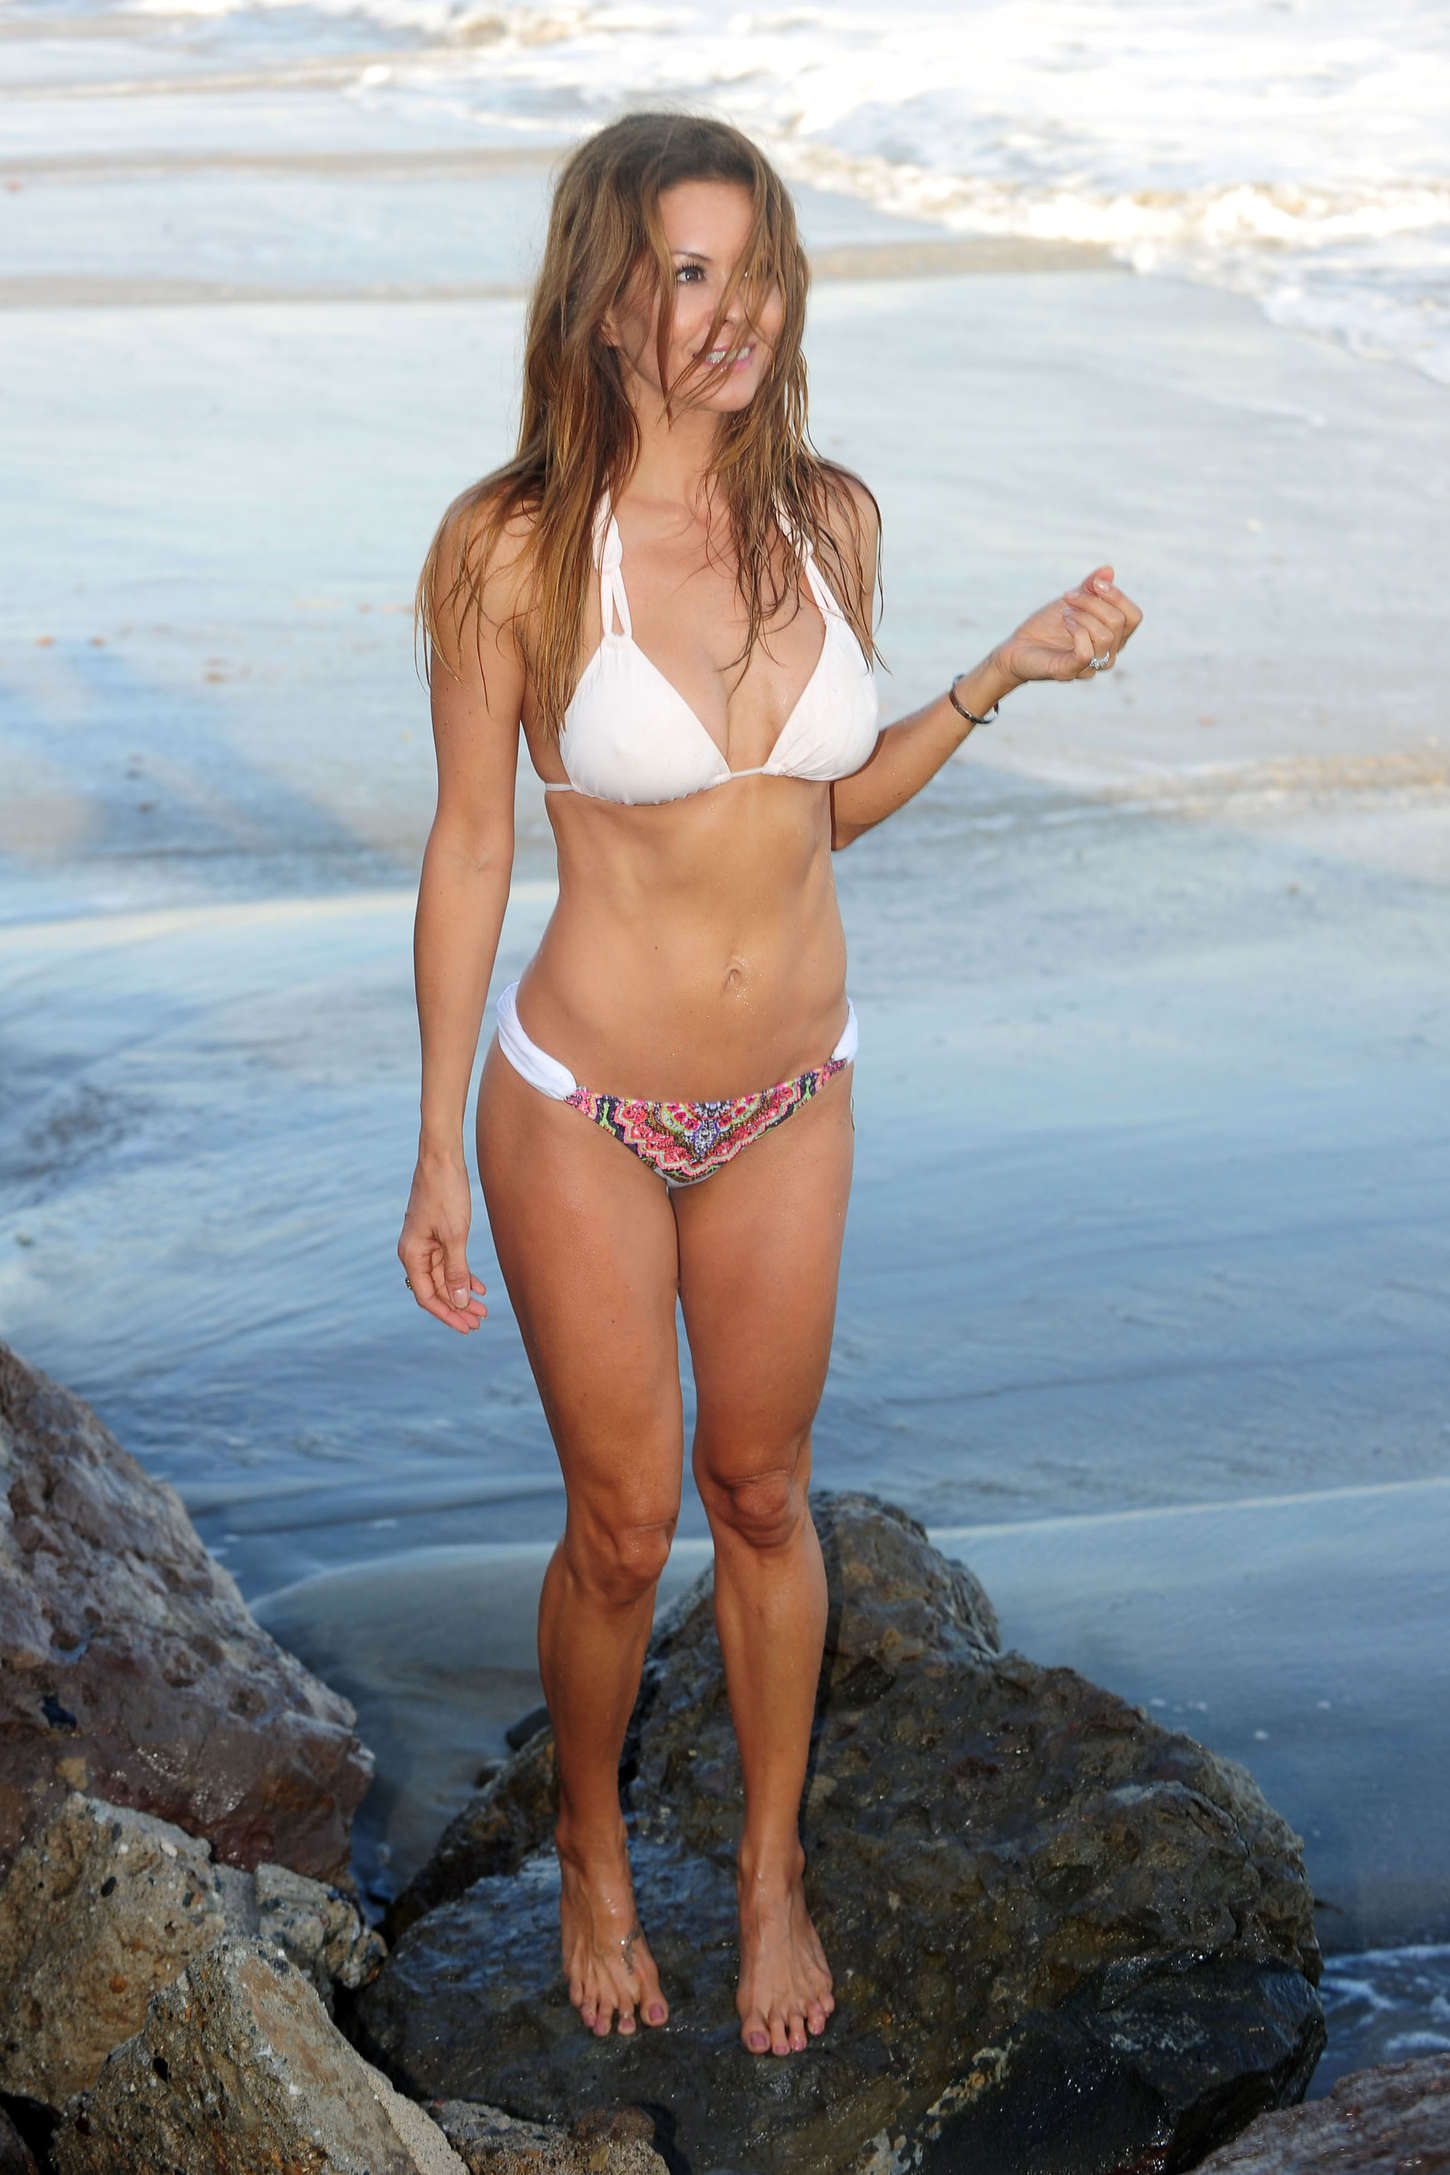 brooke burke in white bikini